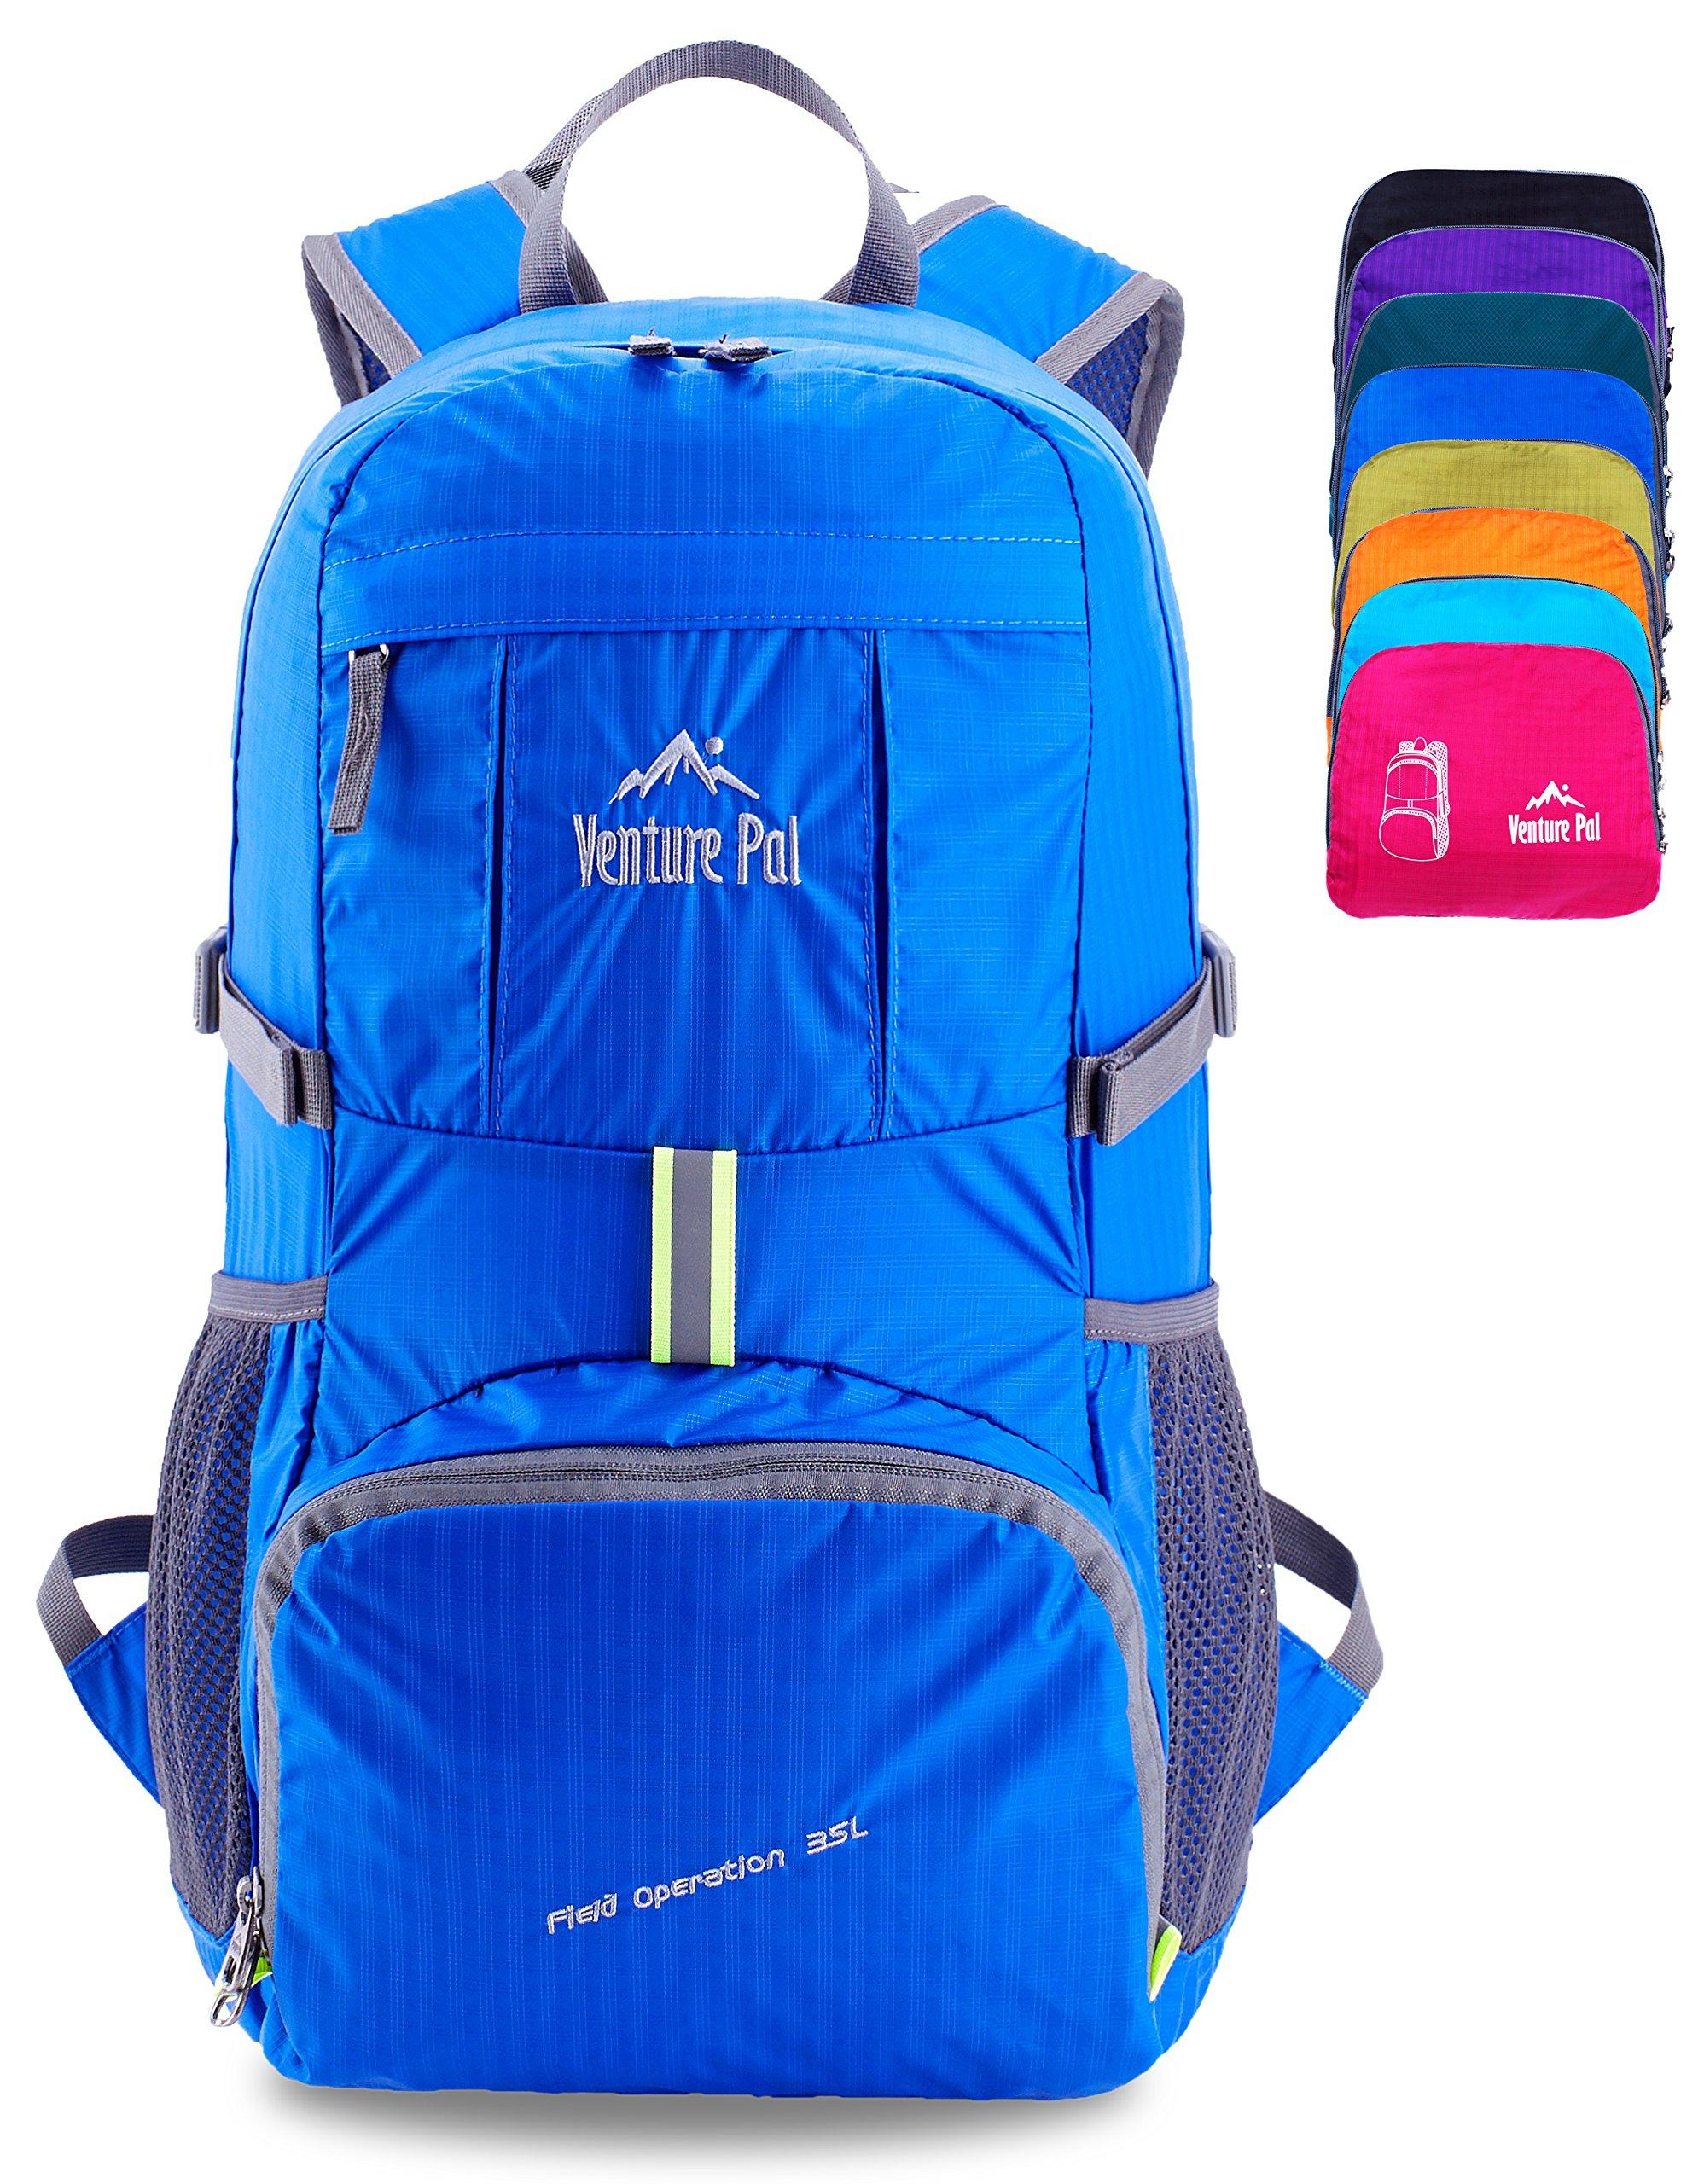 Venture Pal Lightweight Packable Durable Travel Hiking Backpack Daypack (Royal Blue) …